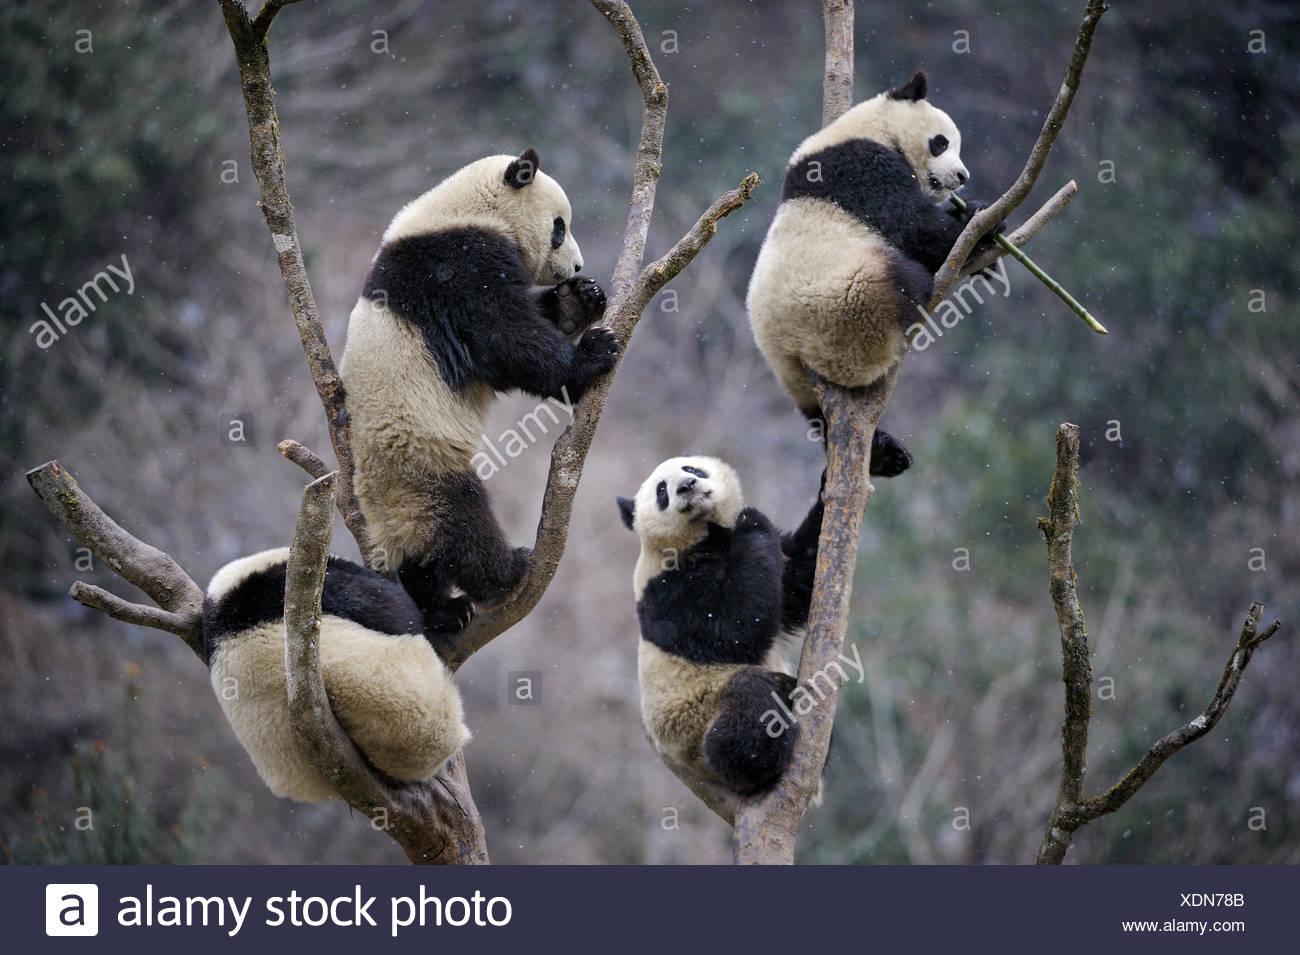 Four subadult Giant pandas (Ailuropoda melanoleuca) climbing in tree. Wolong Nature Reserve, Wenchuan, Sichuan Province, China. - Stock Image